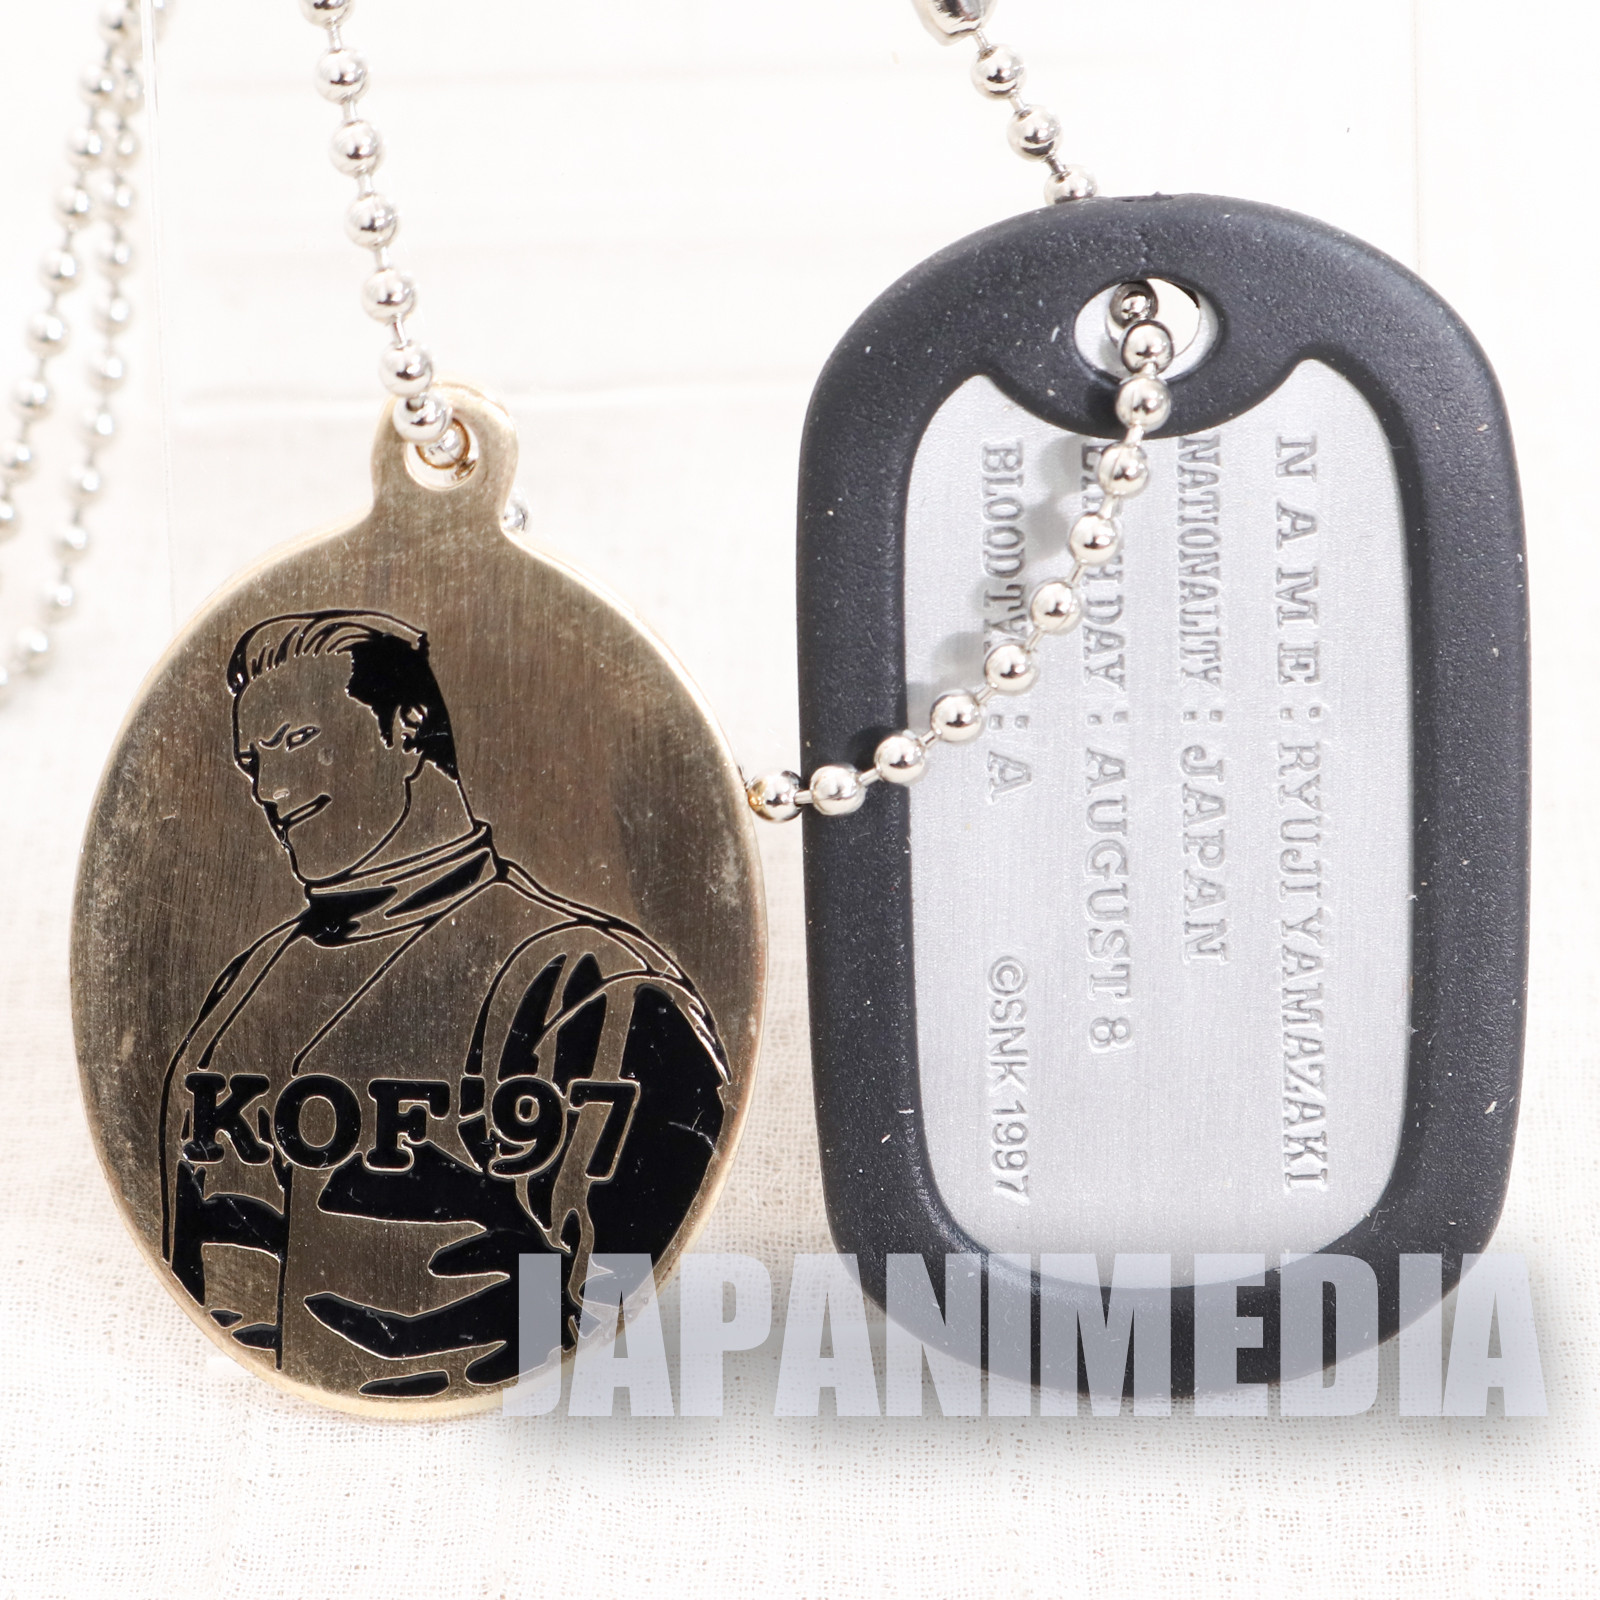 KOF '97 / King of Fighters Ryuji Yamazaki Metal Plate Ballchain SNK JAPAN NEOGEO